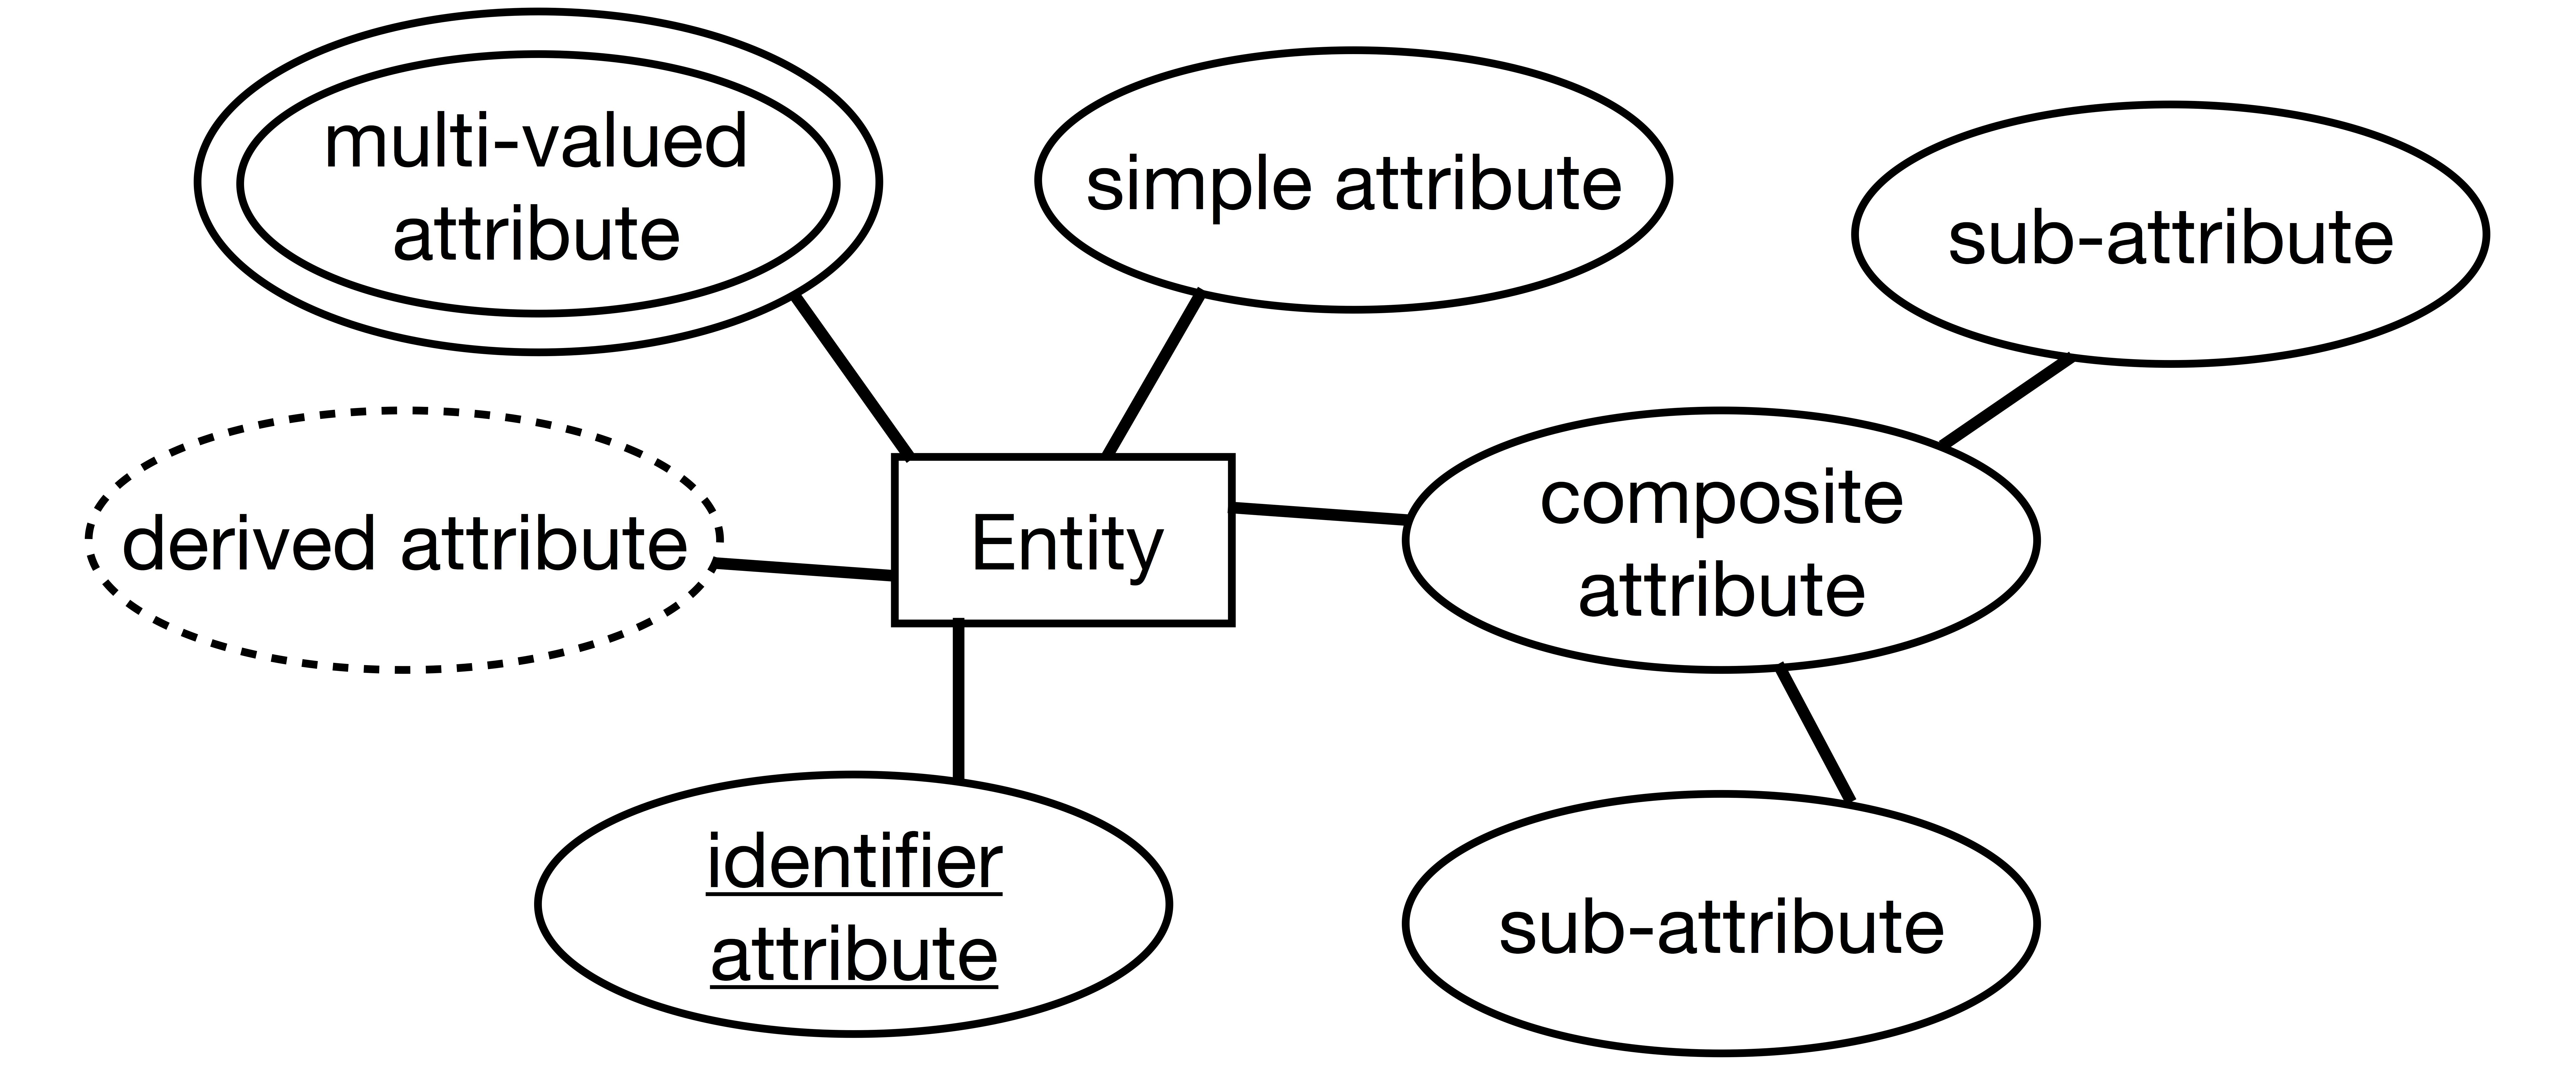 Iste-608 Study Guide, Part 2 · Briennakh throughout Er Diagram Entity Vs Attribute